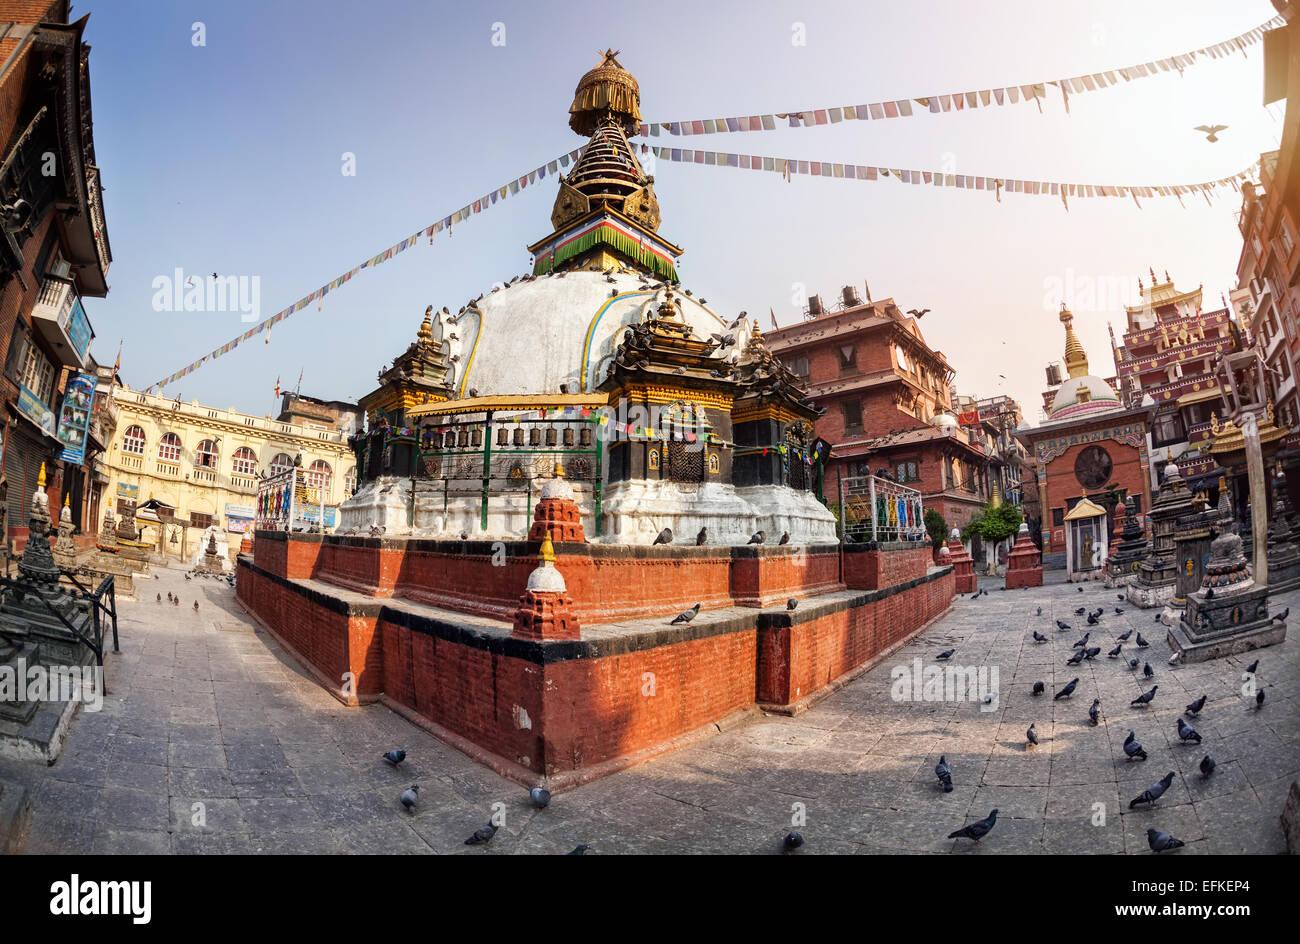 Kathesimbhu Buddhist stupa in courtyard in Thamel, Kathmandu, Nepal - Stock Image